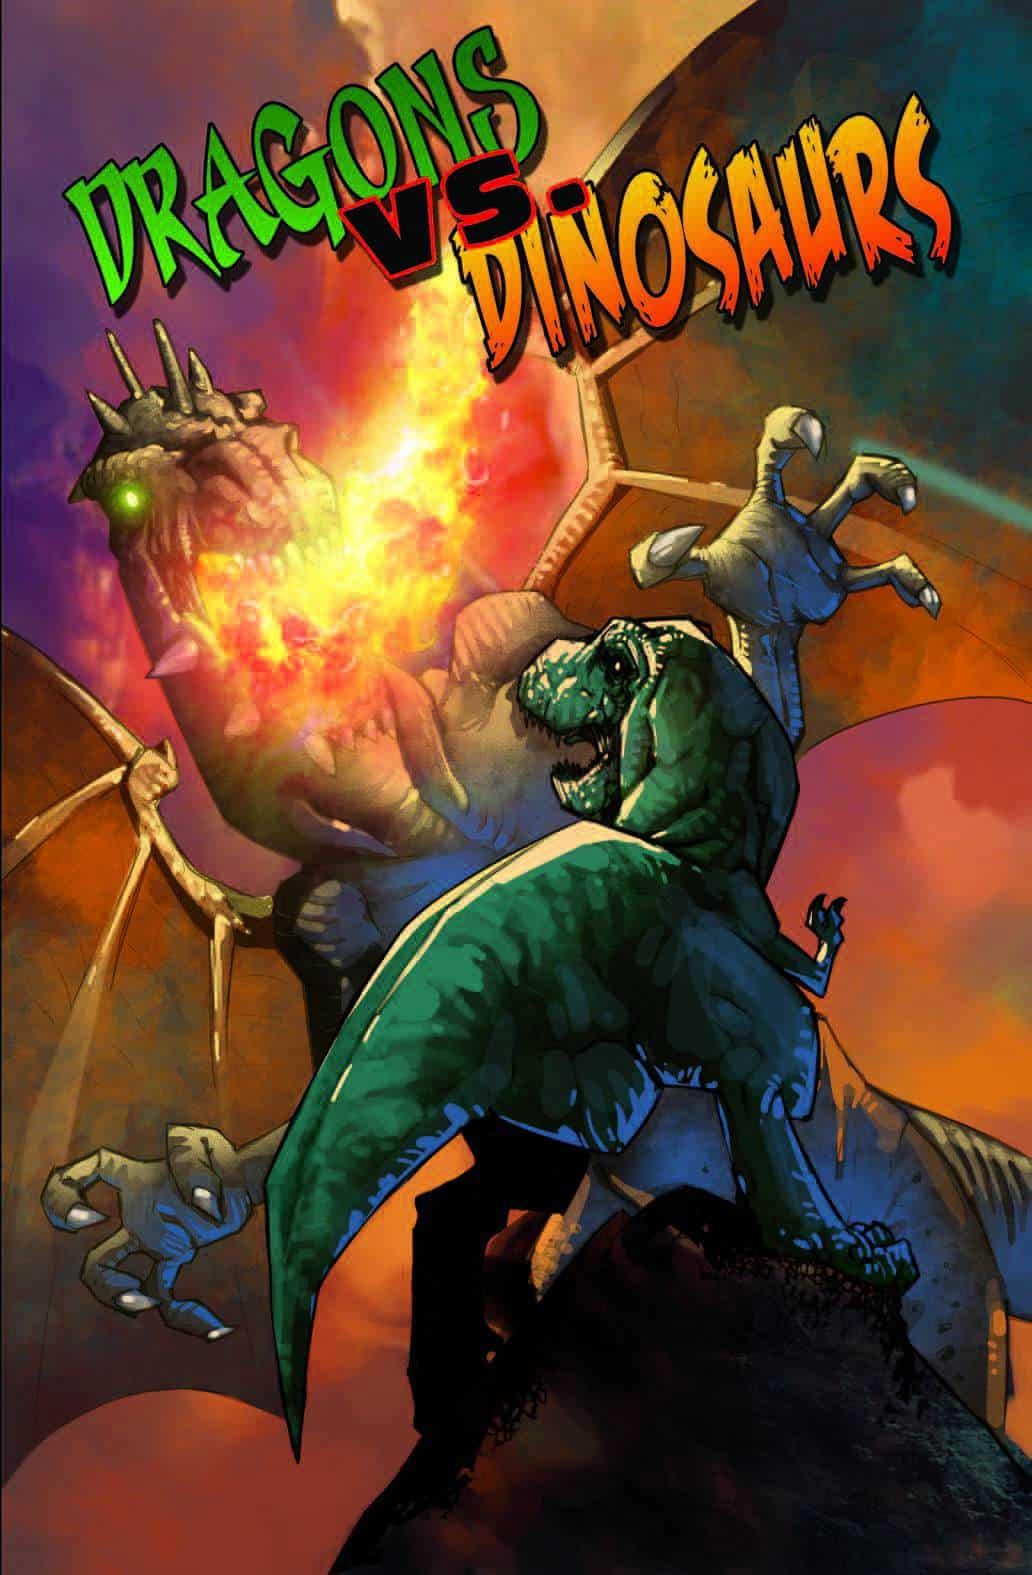 Dragons-vs-Dinosaurs-Cover